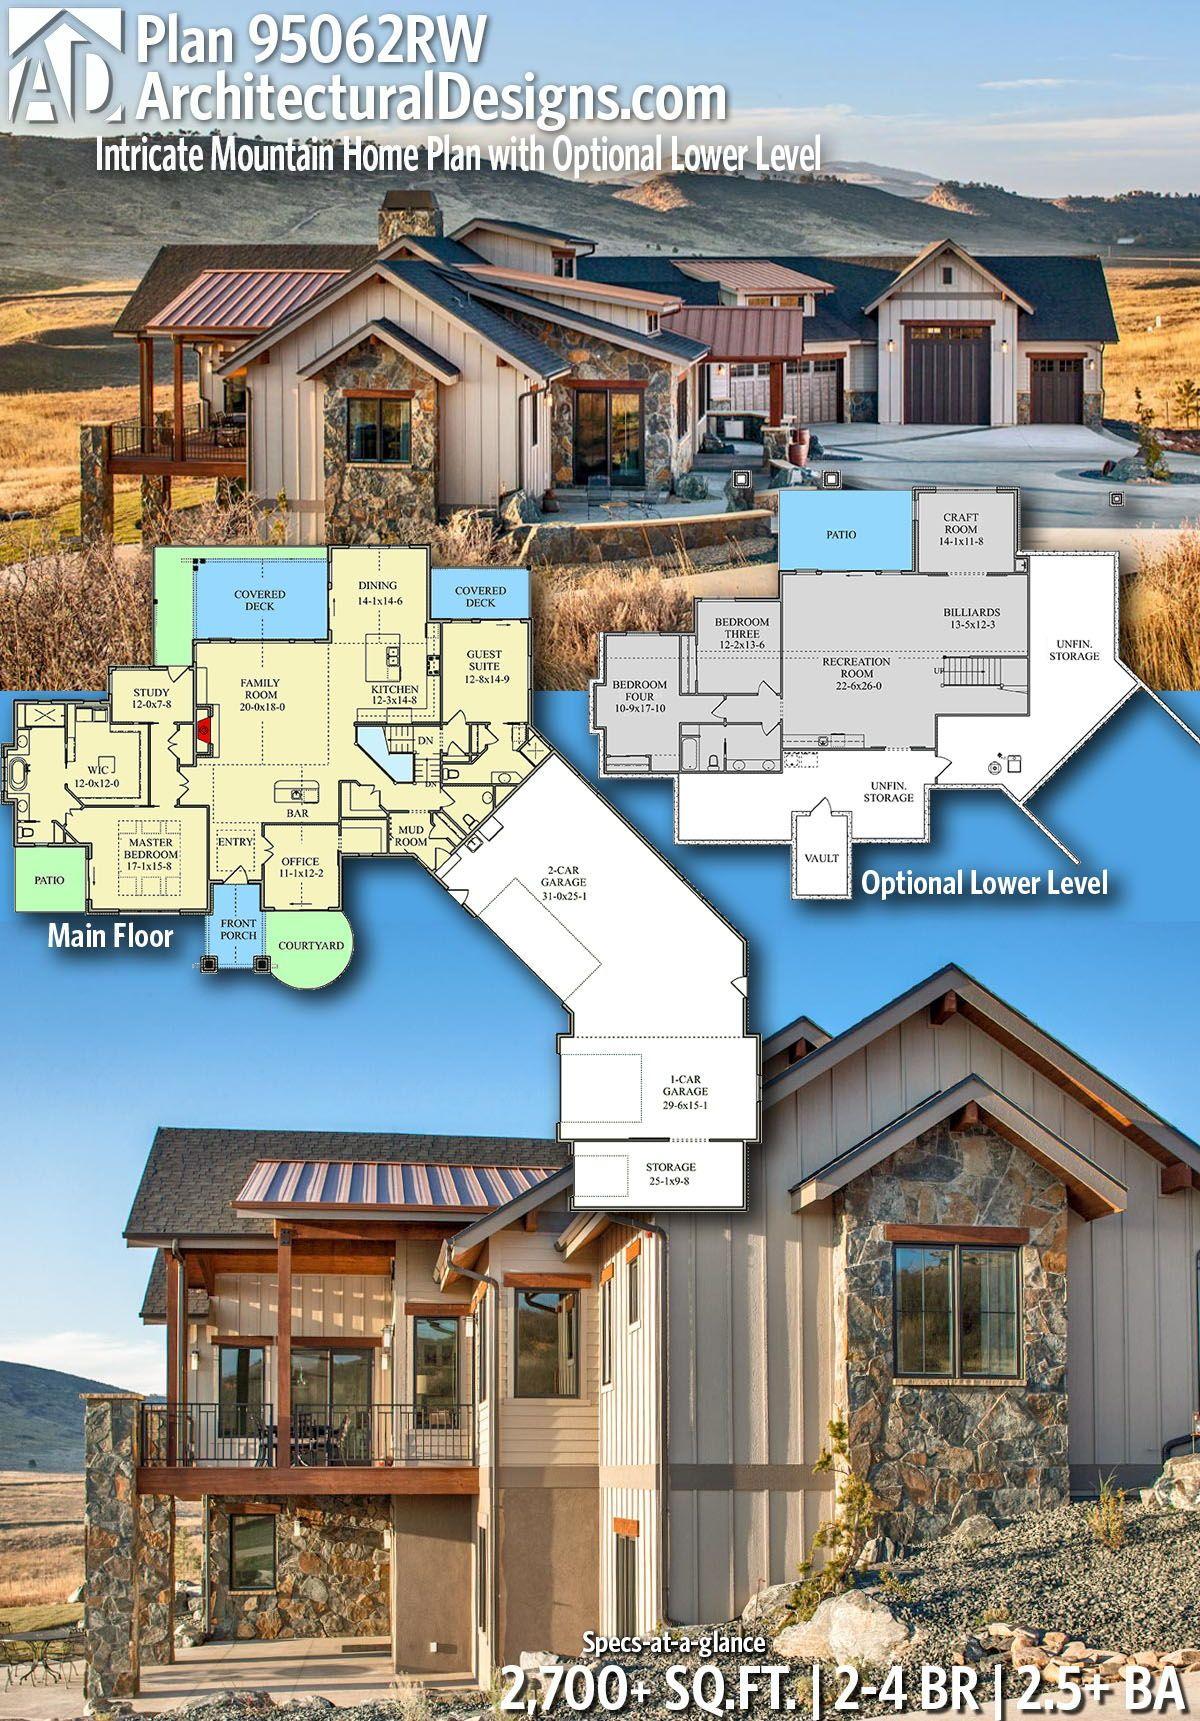 Plan 95062rw Intricate Mountain Home With Optional